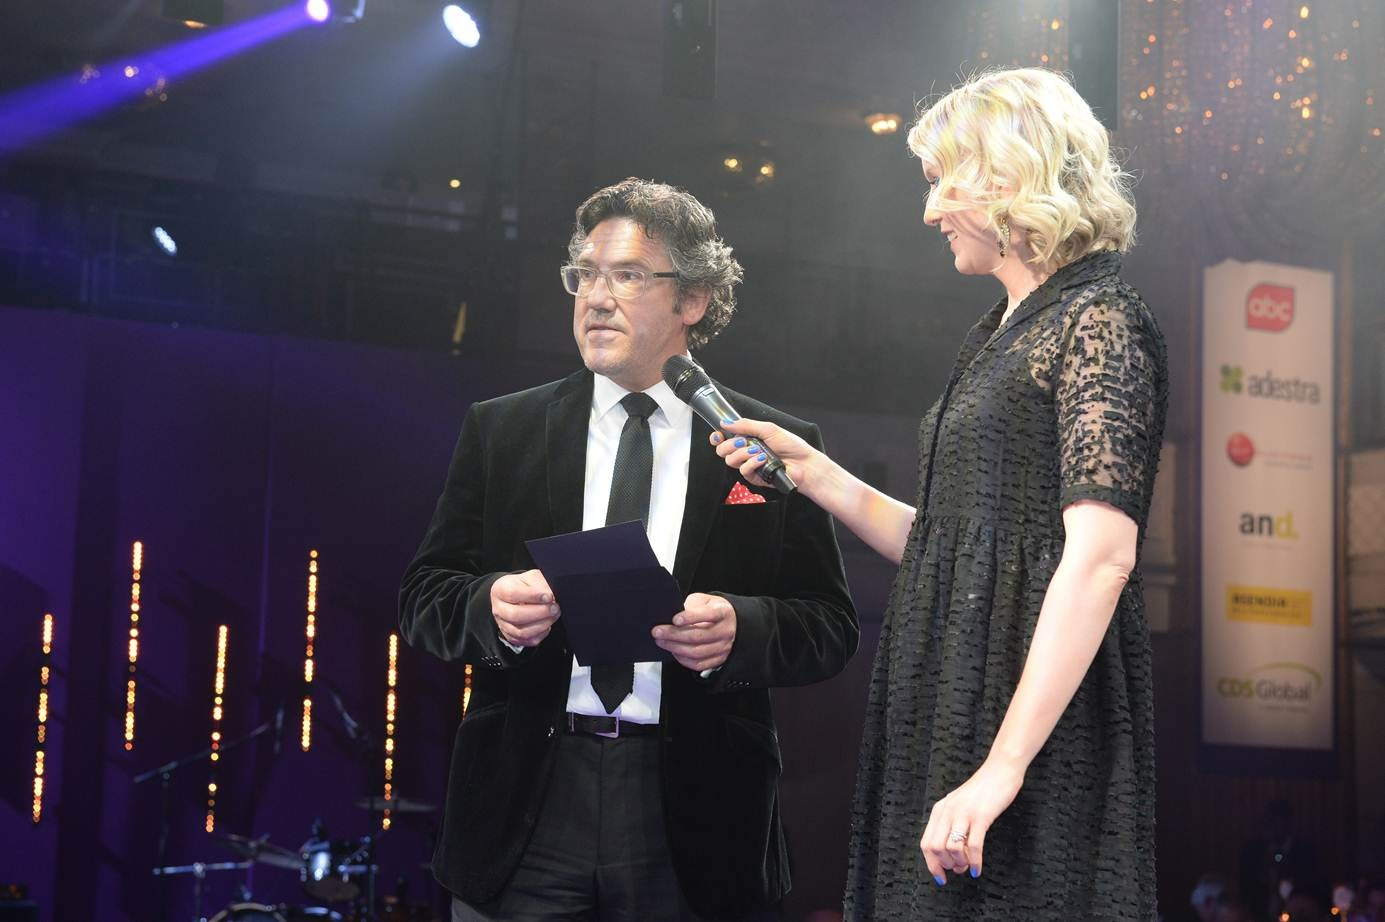 Steve Award